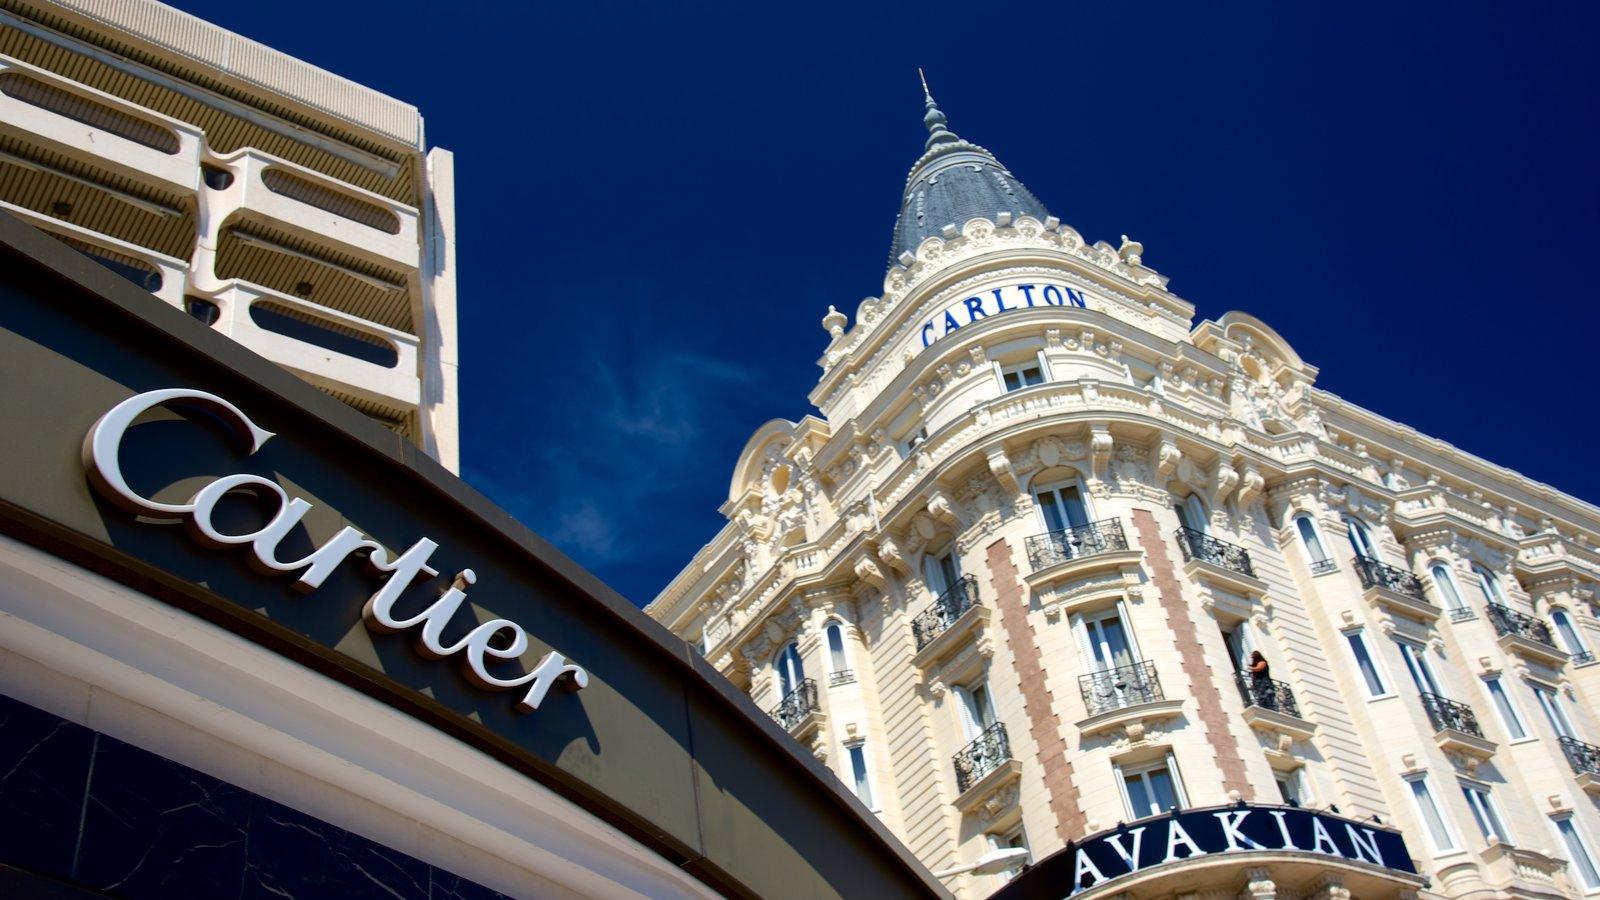 La Croisette que inclui compras e um hotel